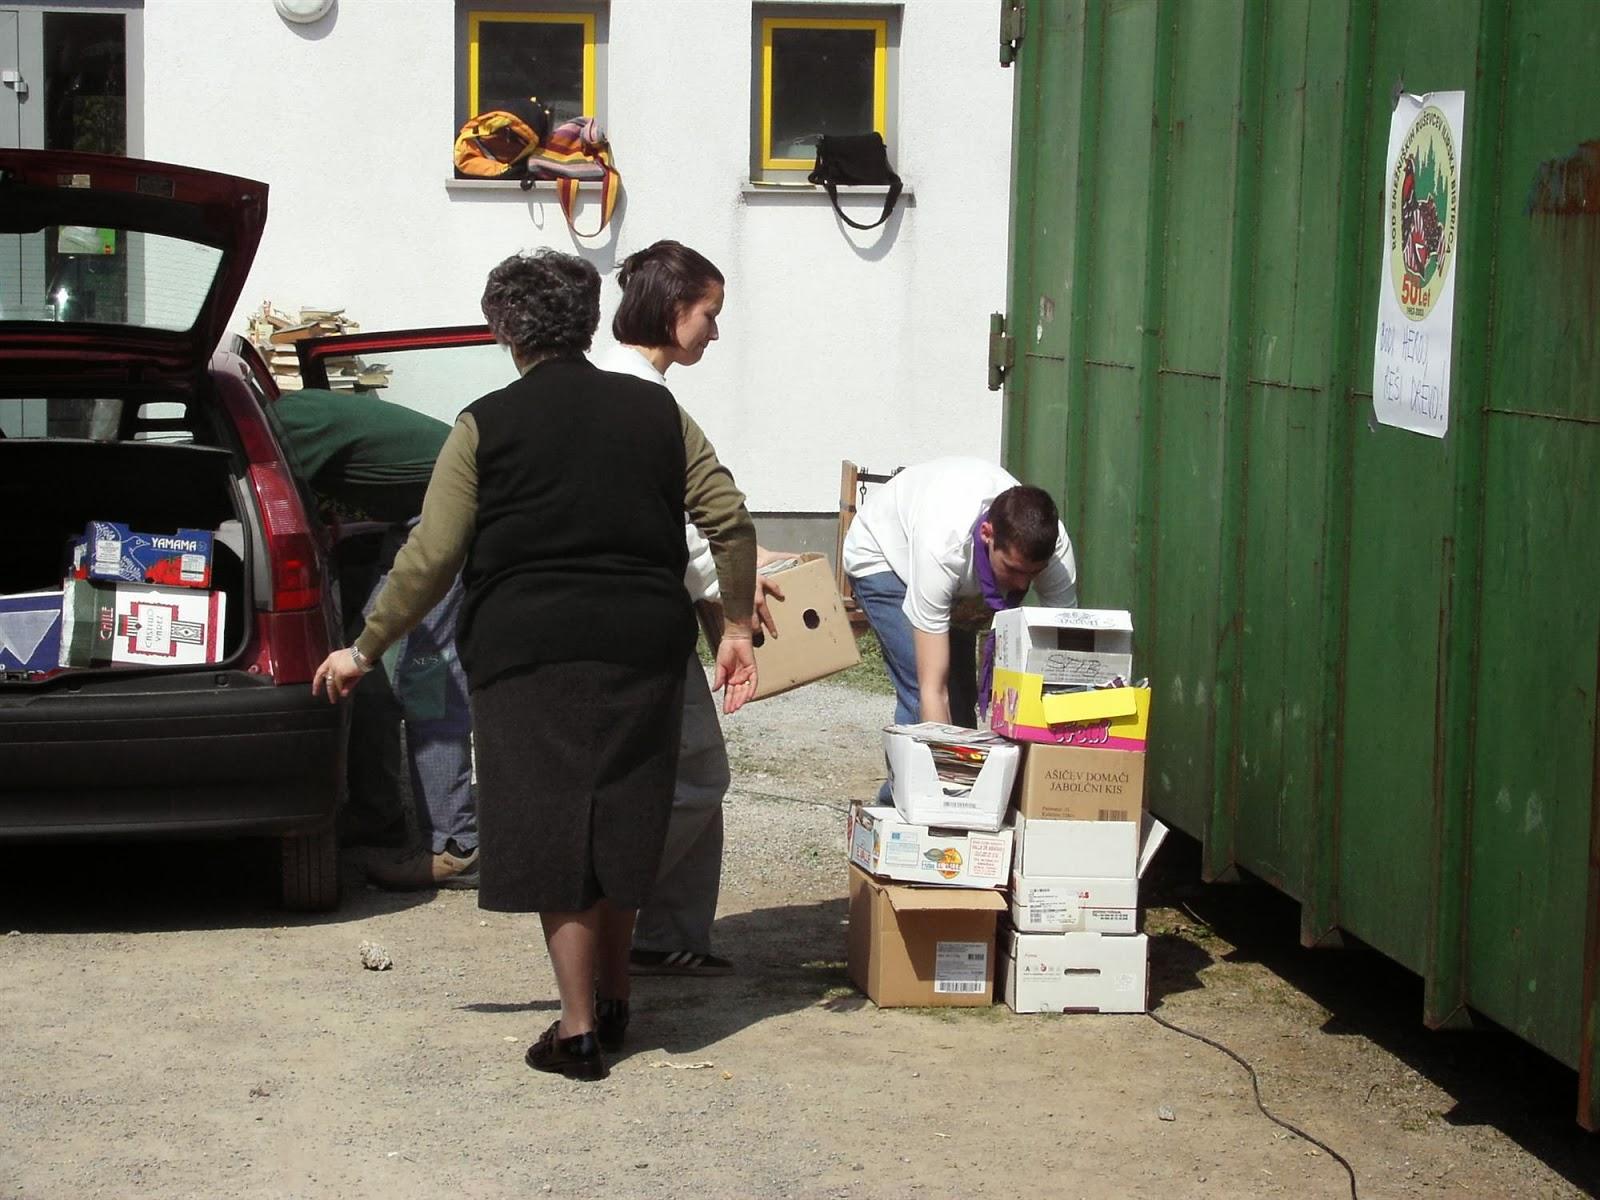 Zbiranje papirja, Ilirska Bistrica 2006 - KIF_8423.JPG